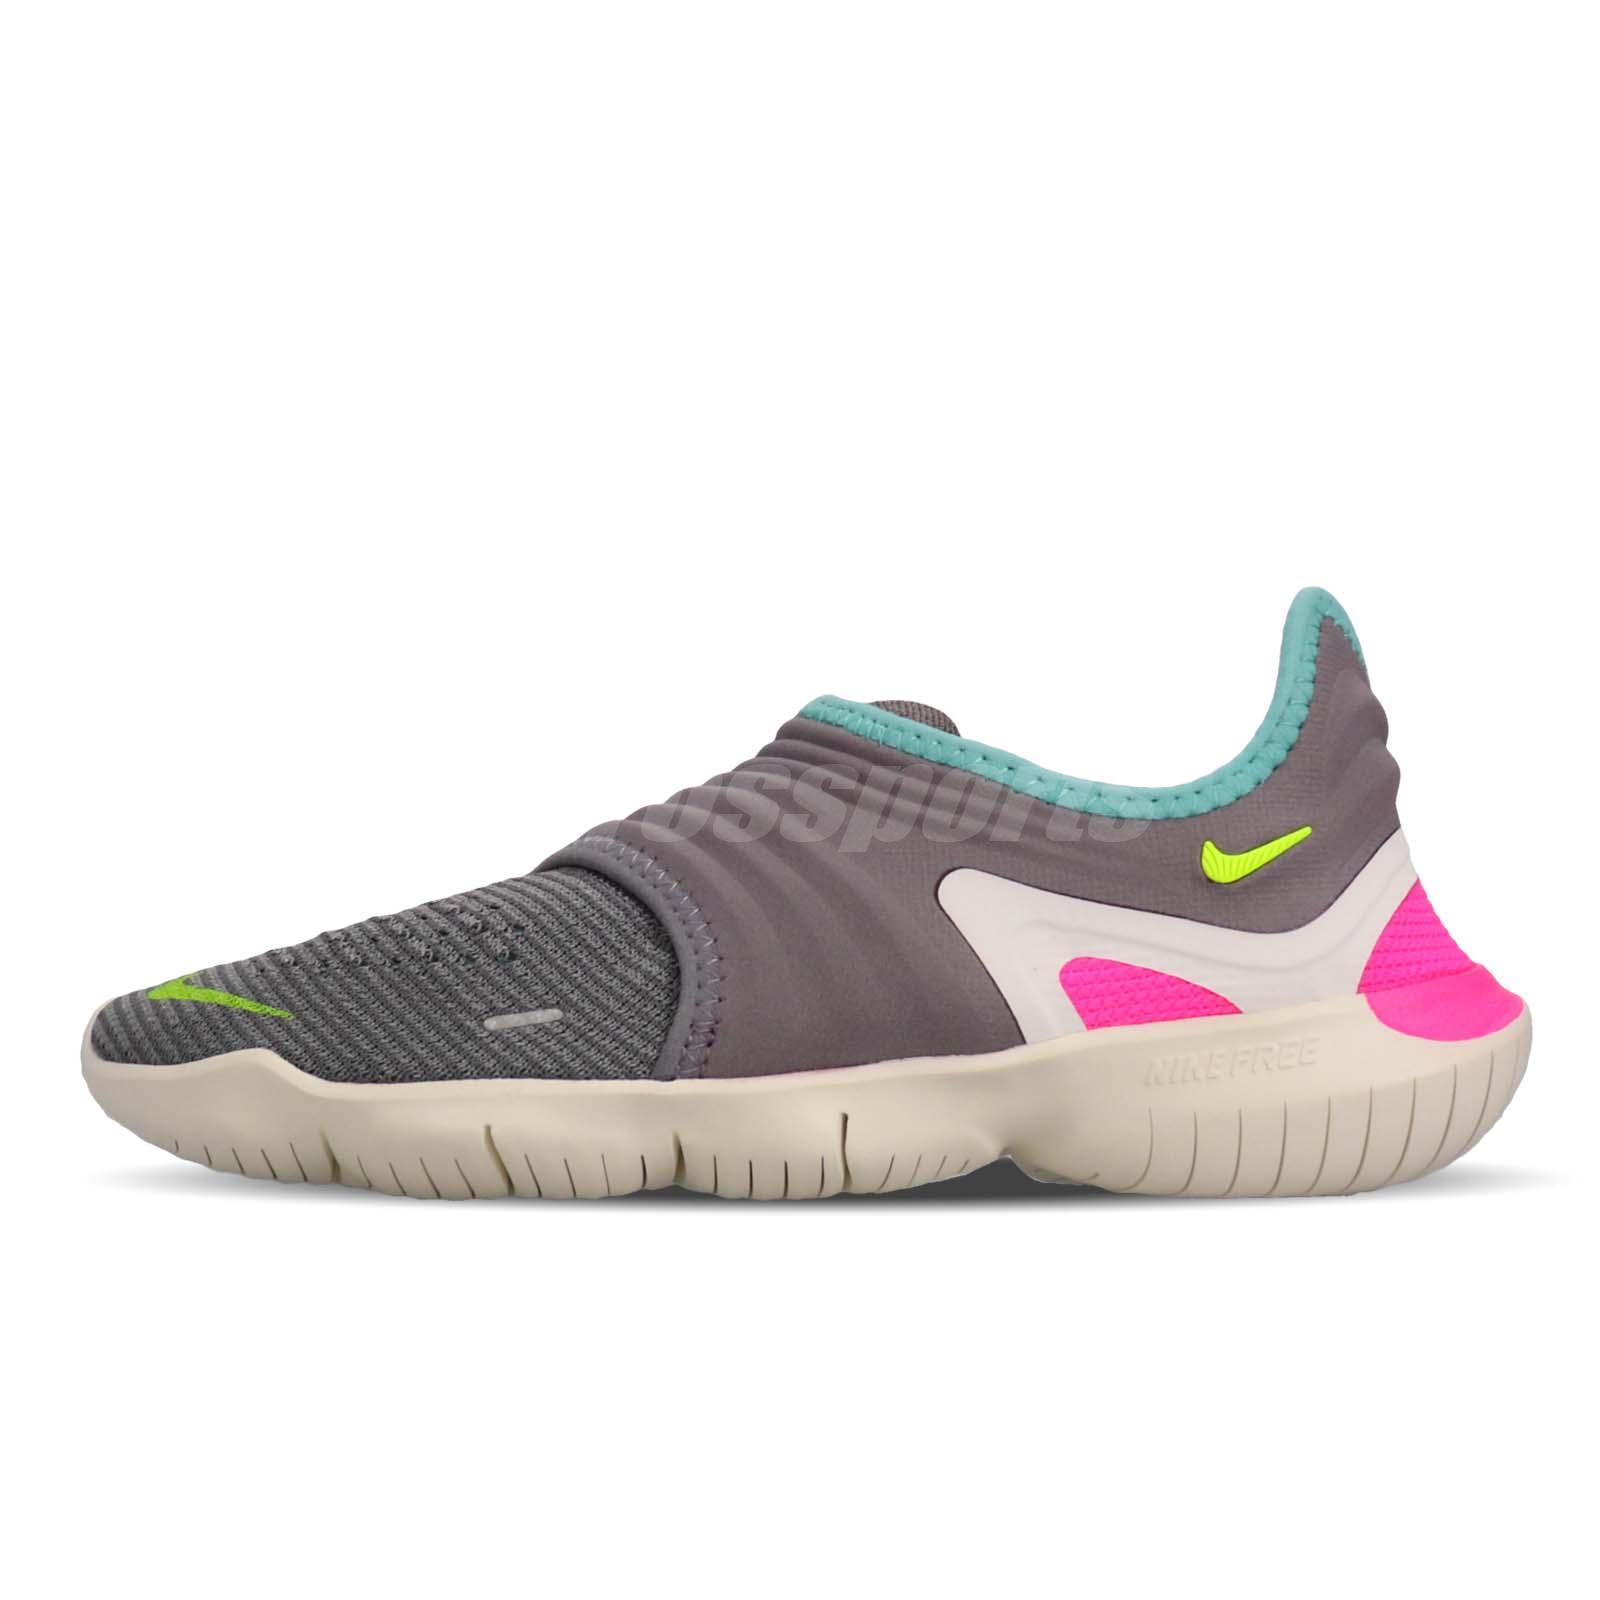 a86a610b8dab7 Nike Wmns Free RN Flyknit 3.0 Grey Green Pink Women Running Shoes AQ5708-002